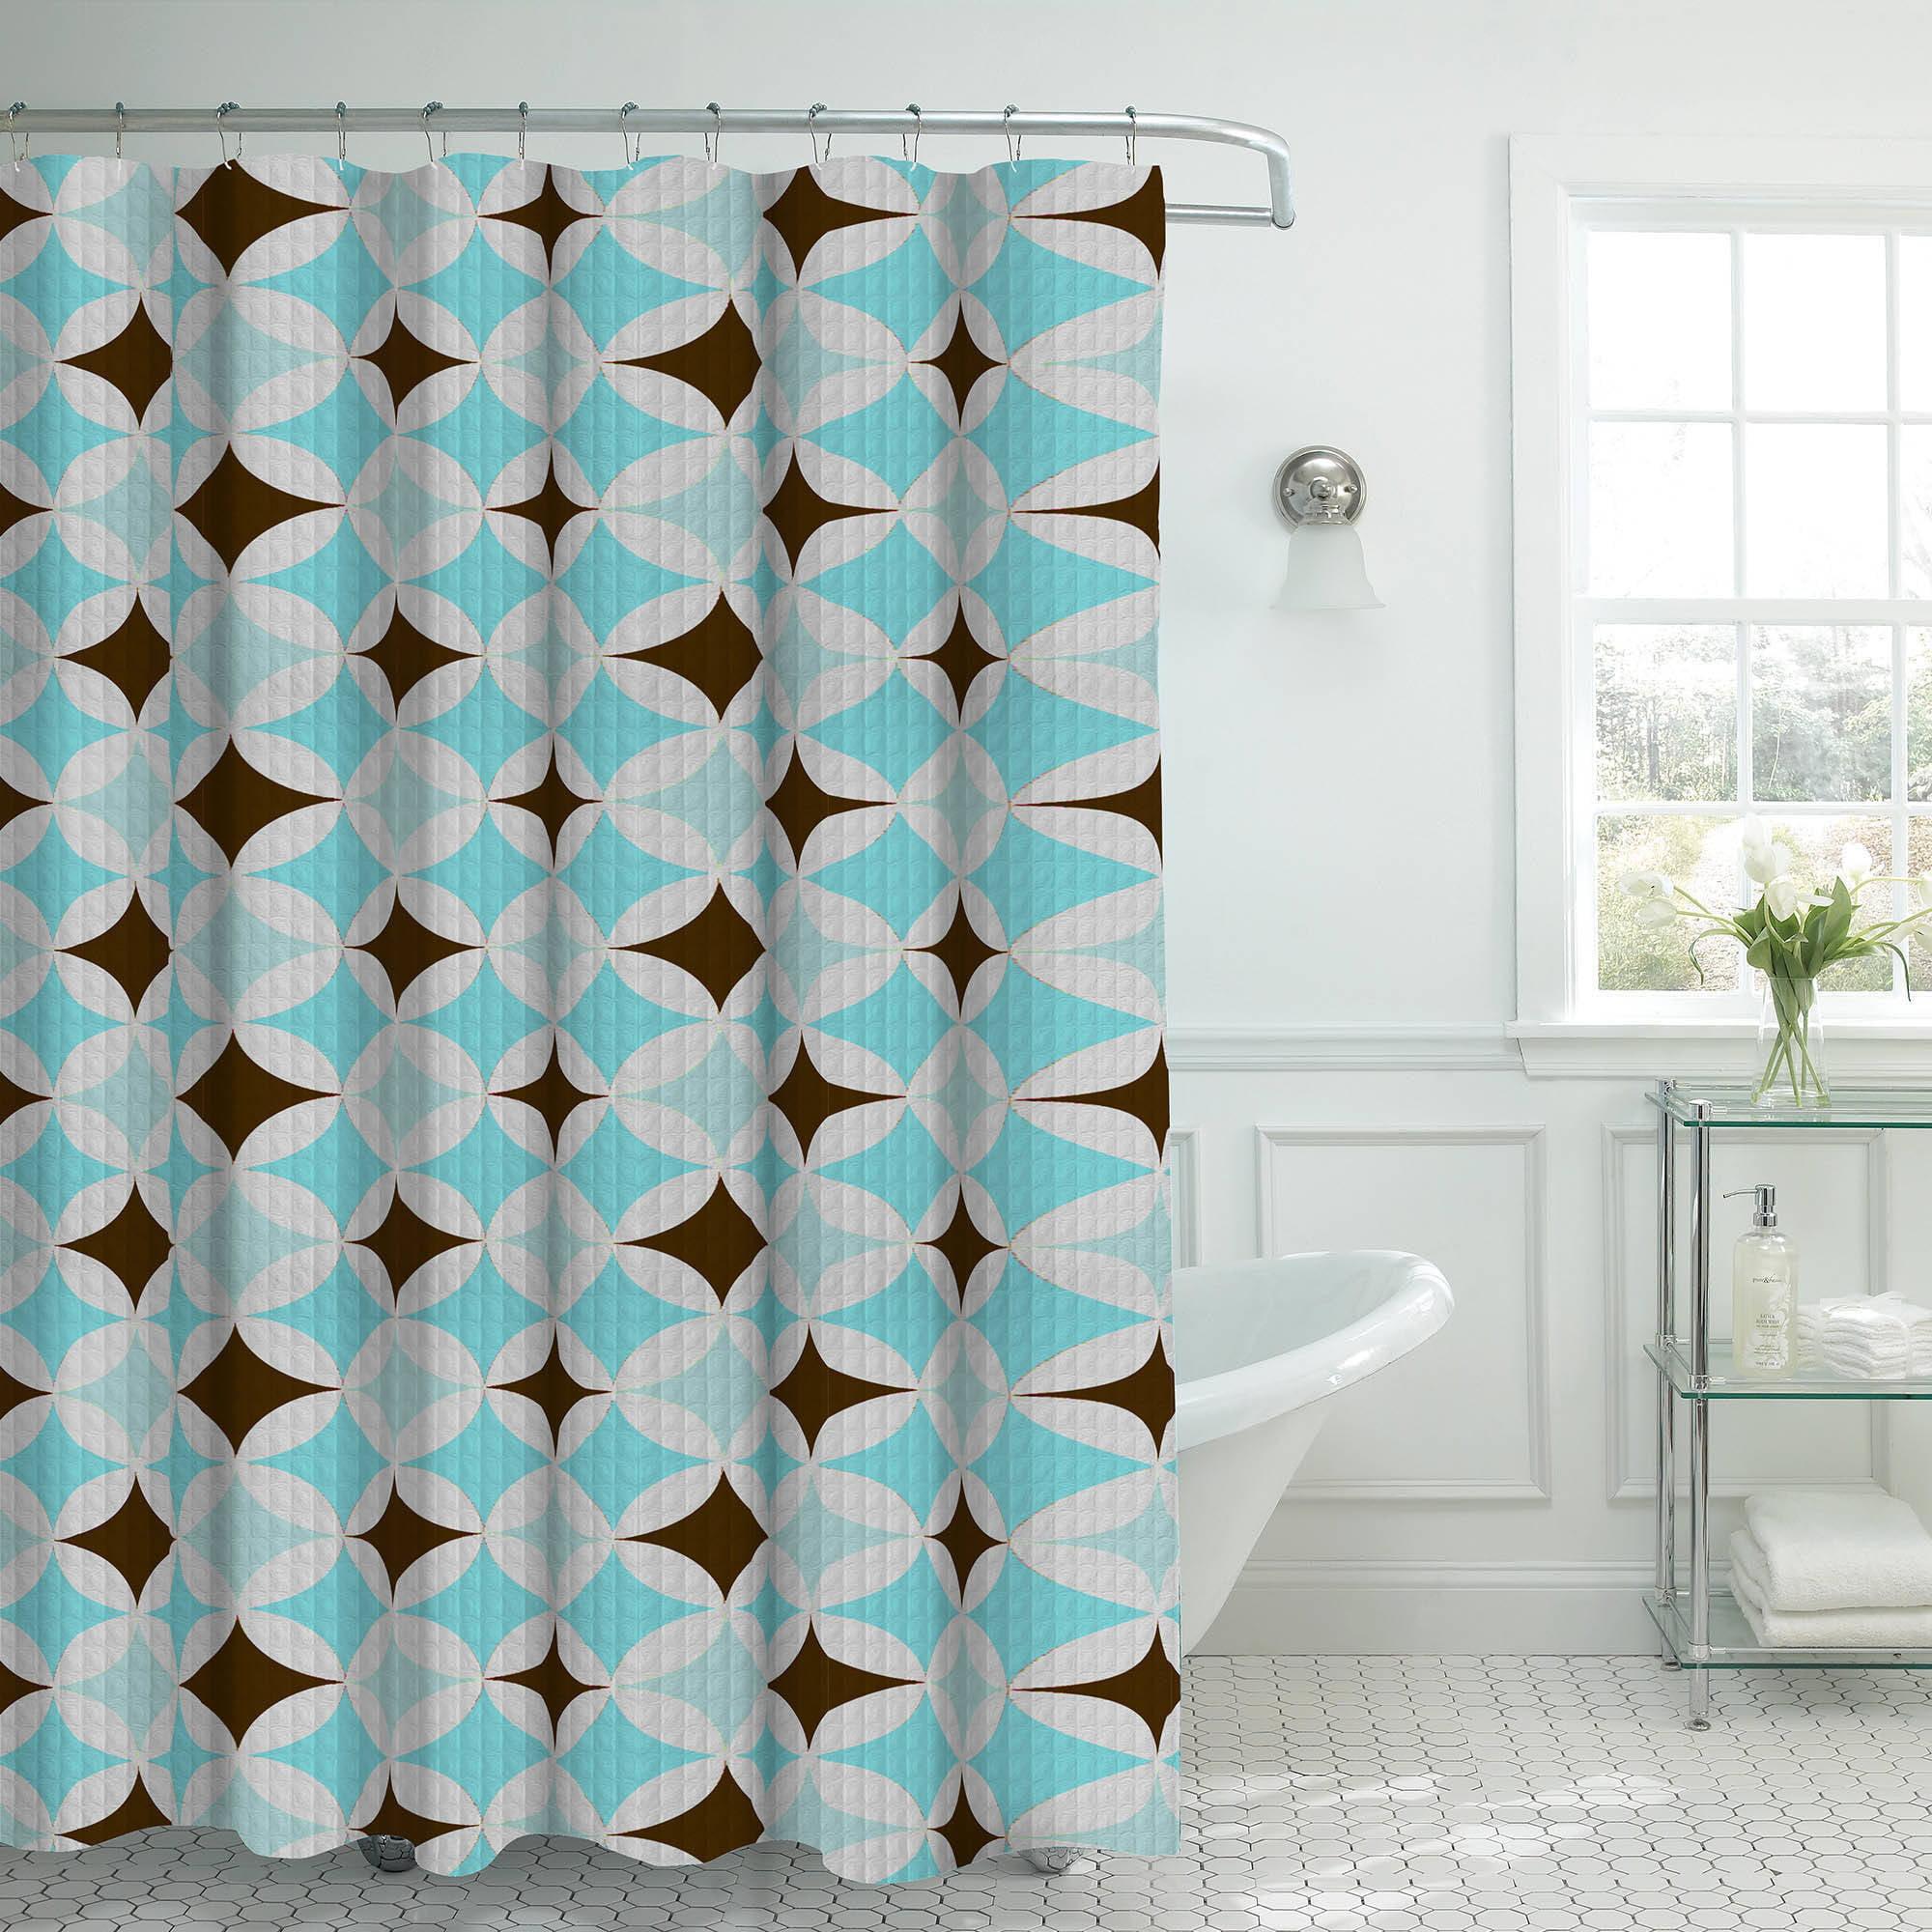 Bounce Comfort Oxford Weave Textured 13-Piece Shower Curtain Set with Metal Roller Hooks, Avatar Aqua